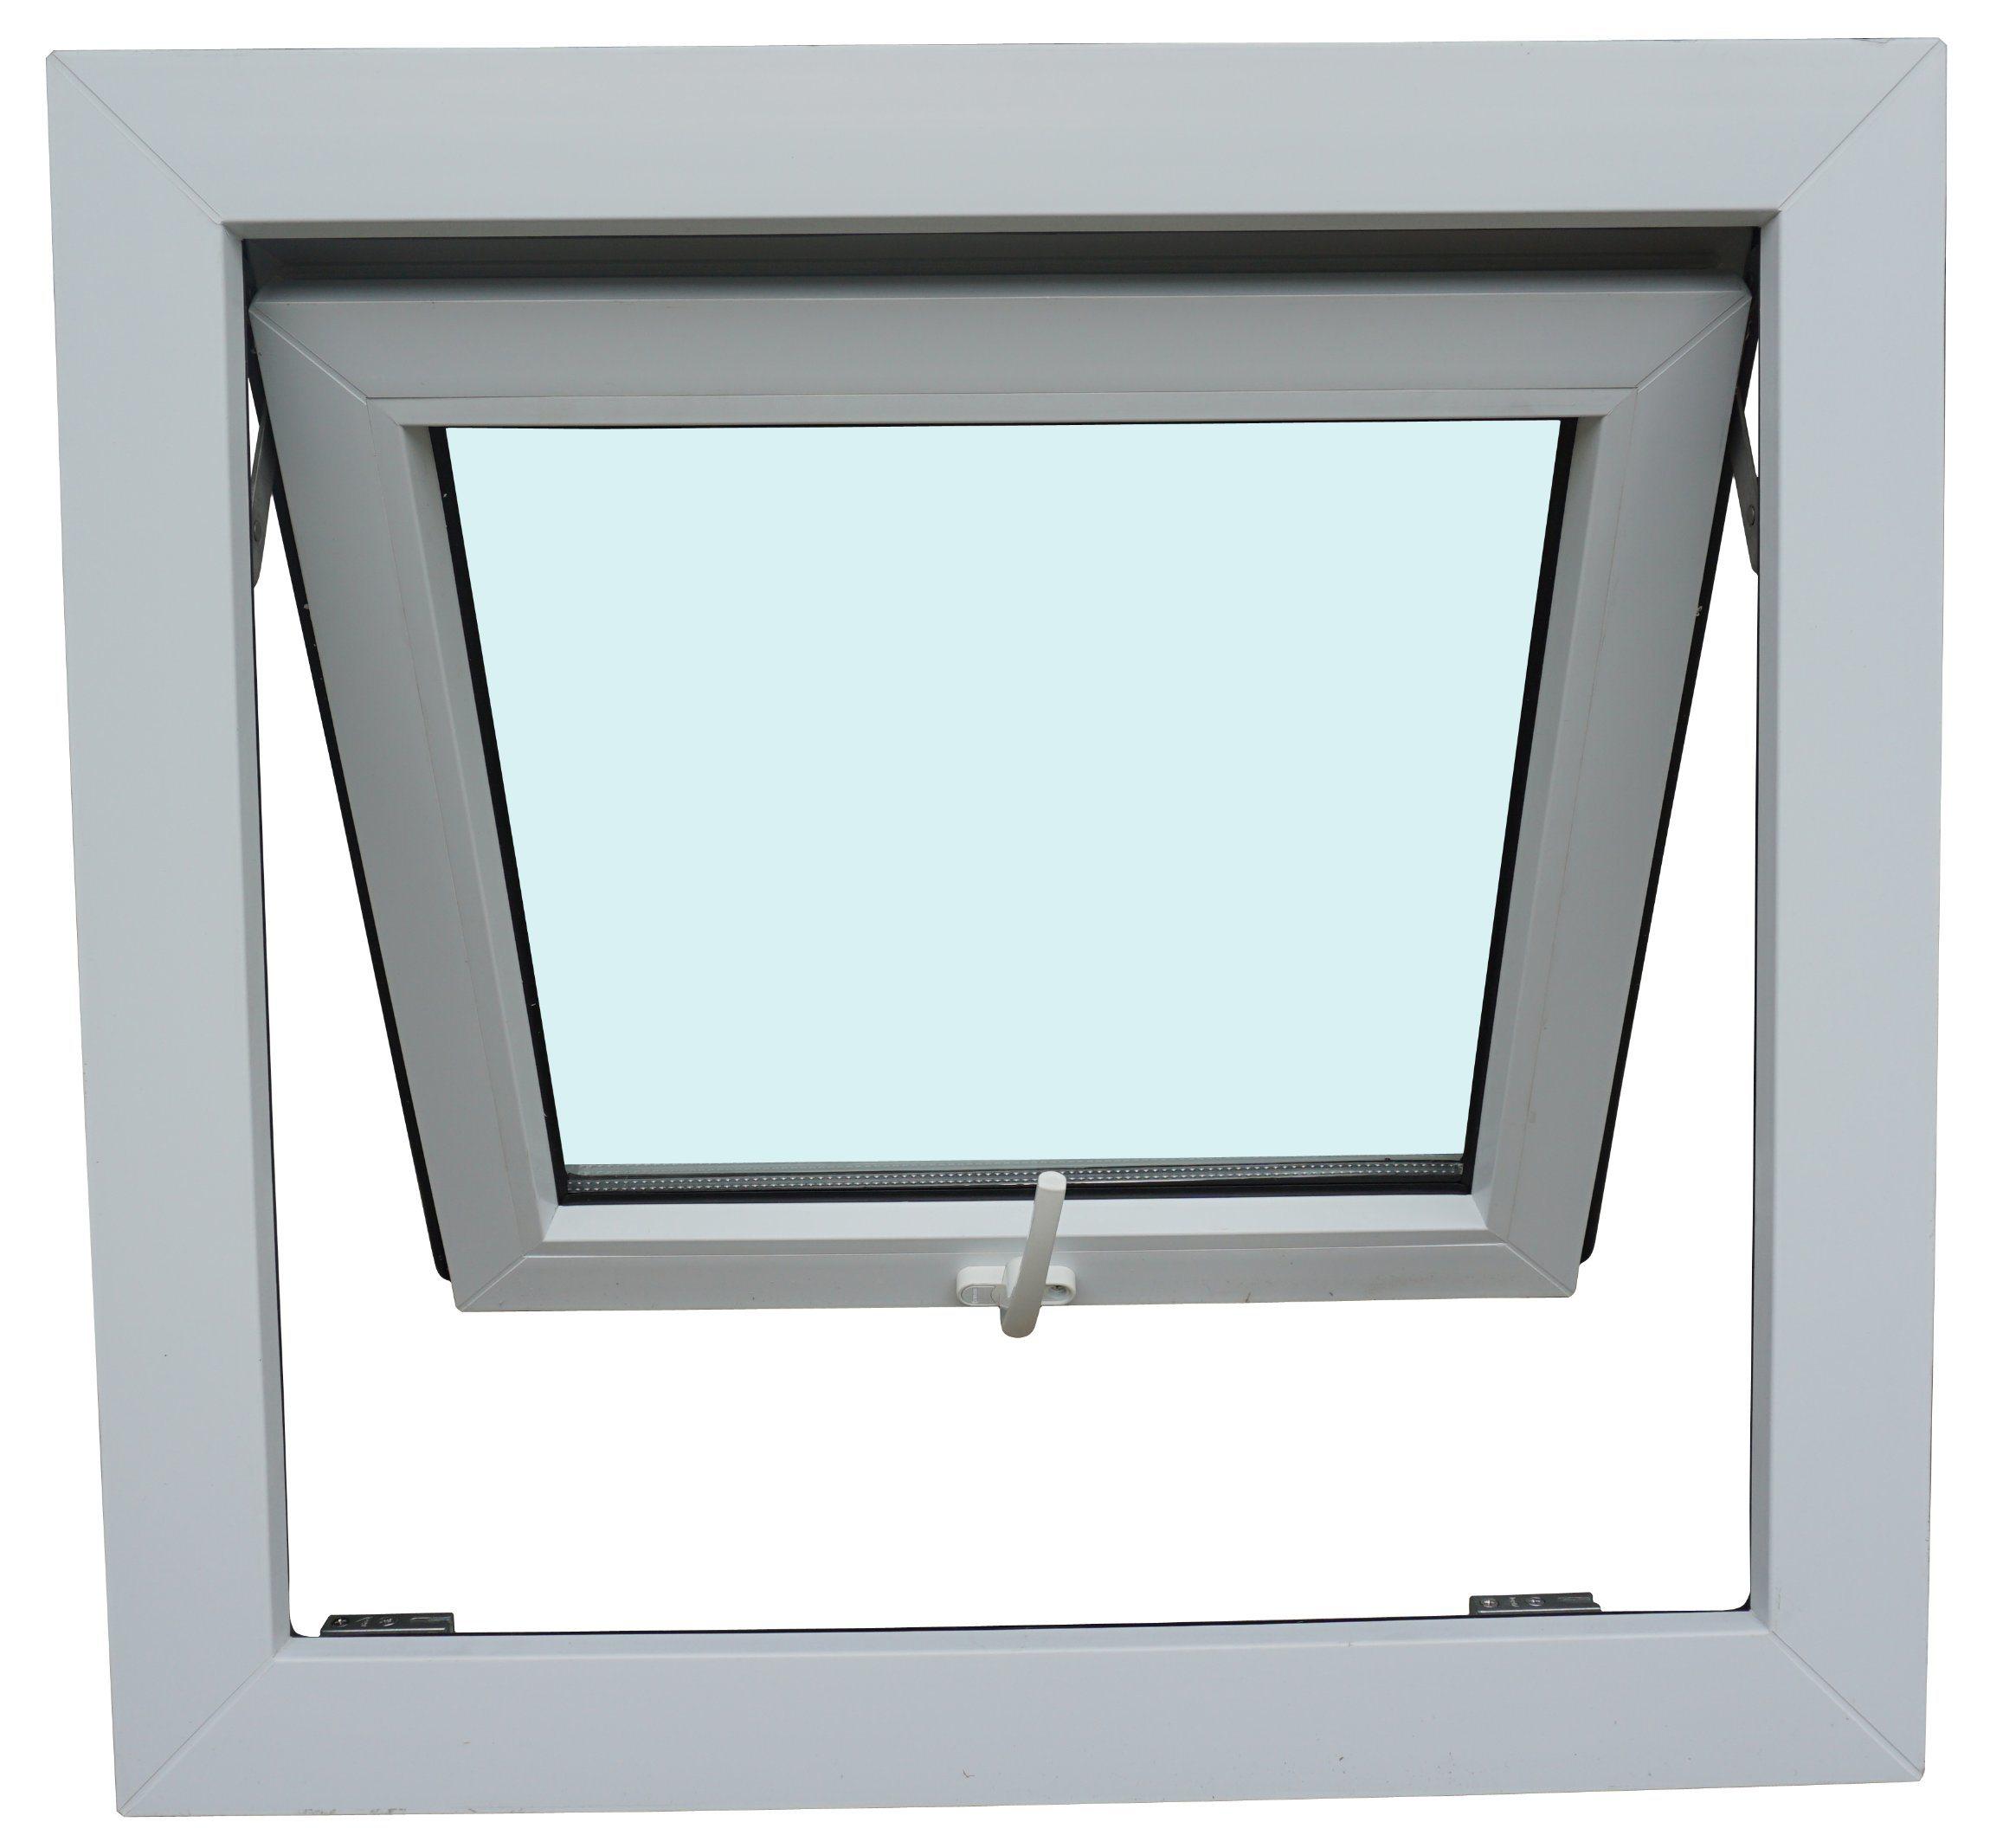 newest ef73c 80b57 [Hot Item] UPVC/PVC Awning Window and Bottom Fixed Windows As2047